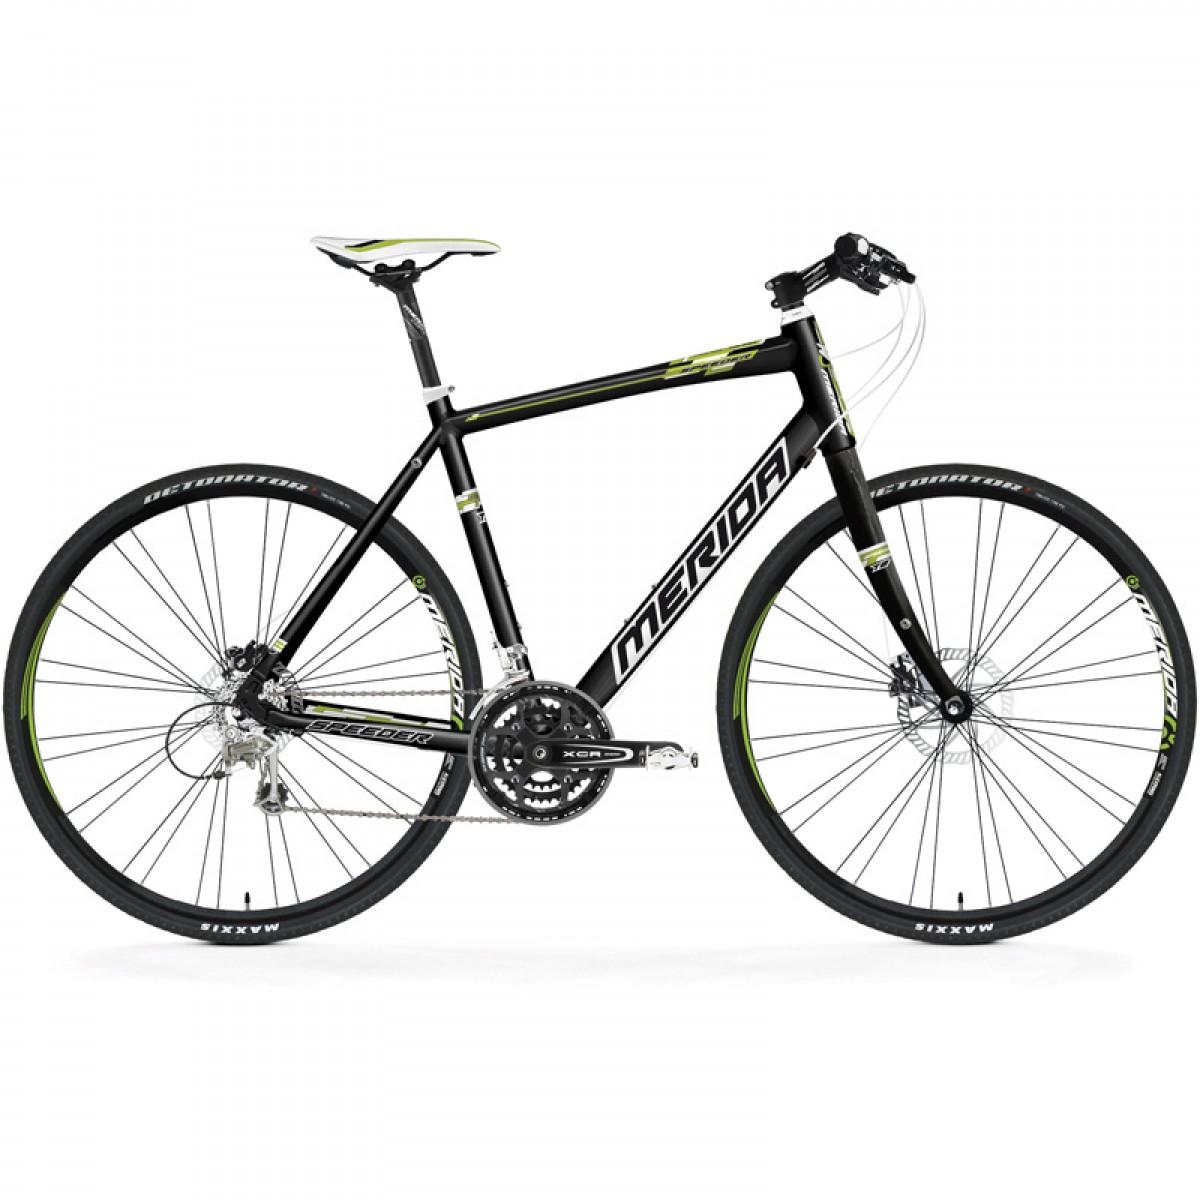 Merida Speeder T2 D Sport Hybrid Bike 2013